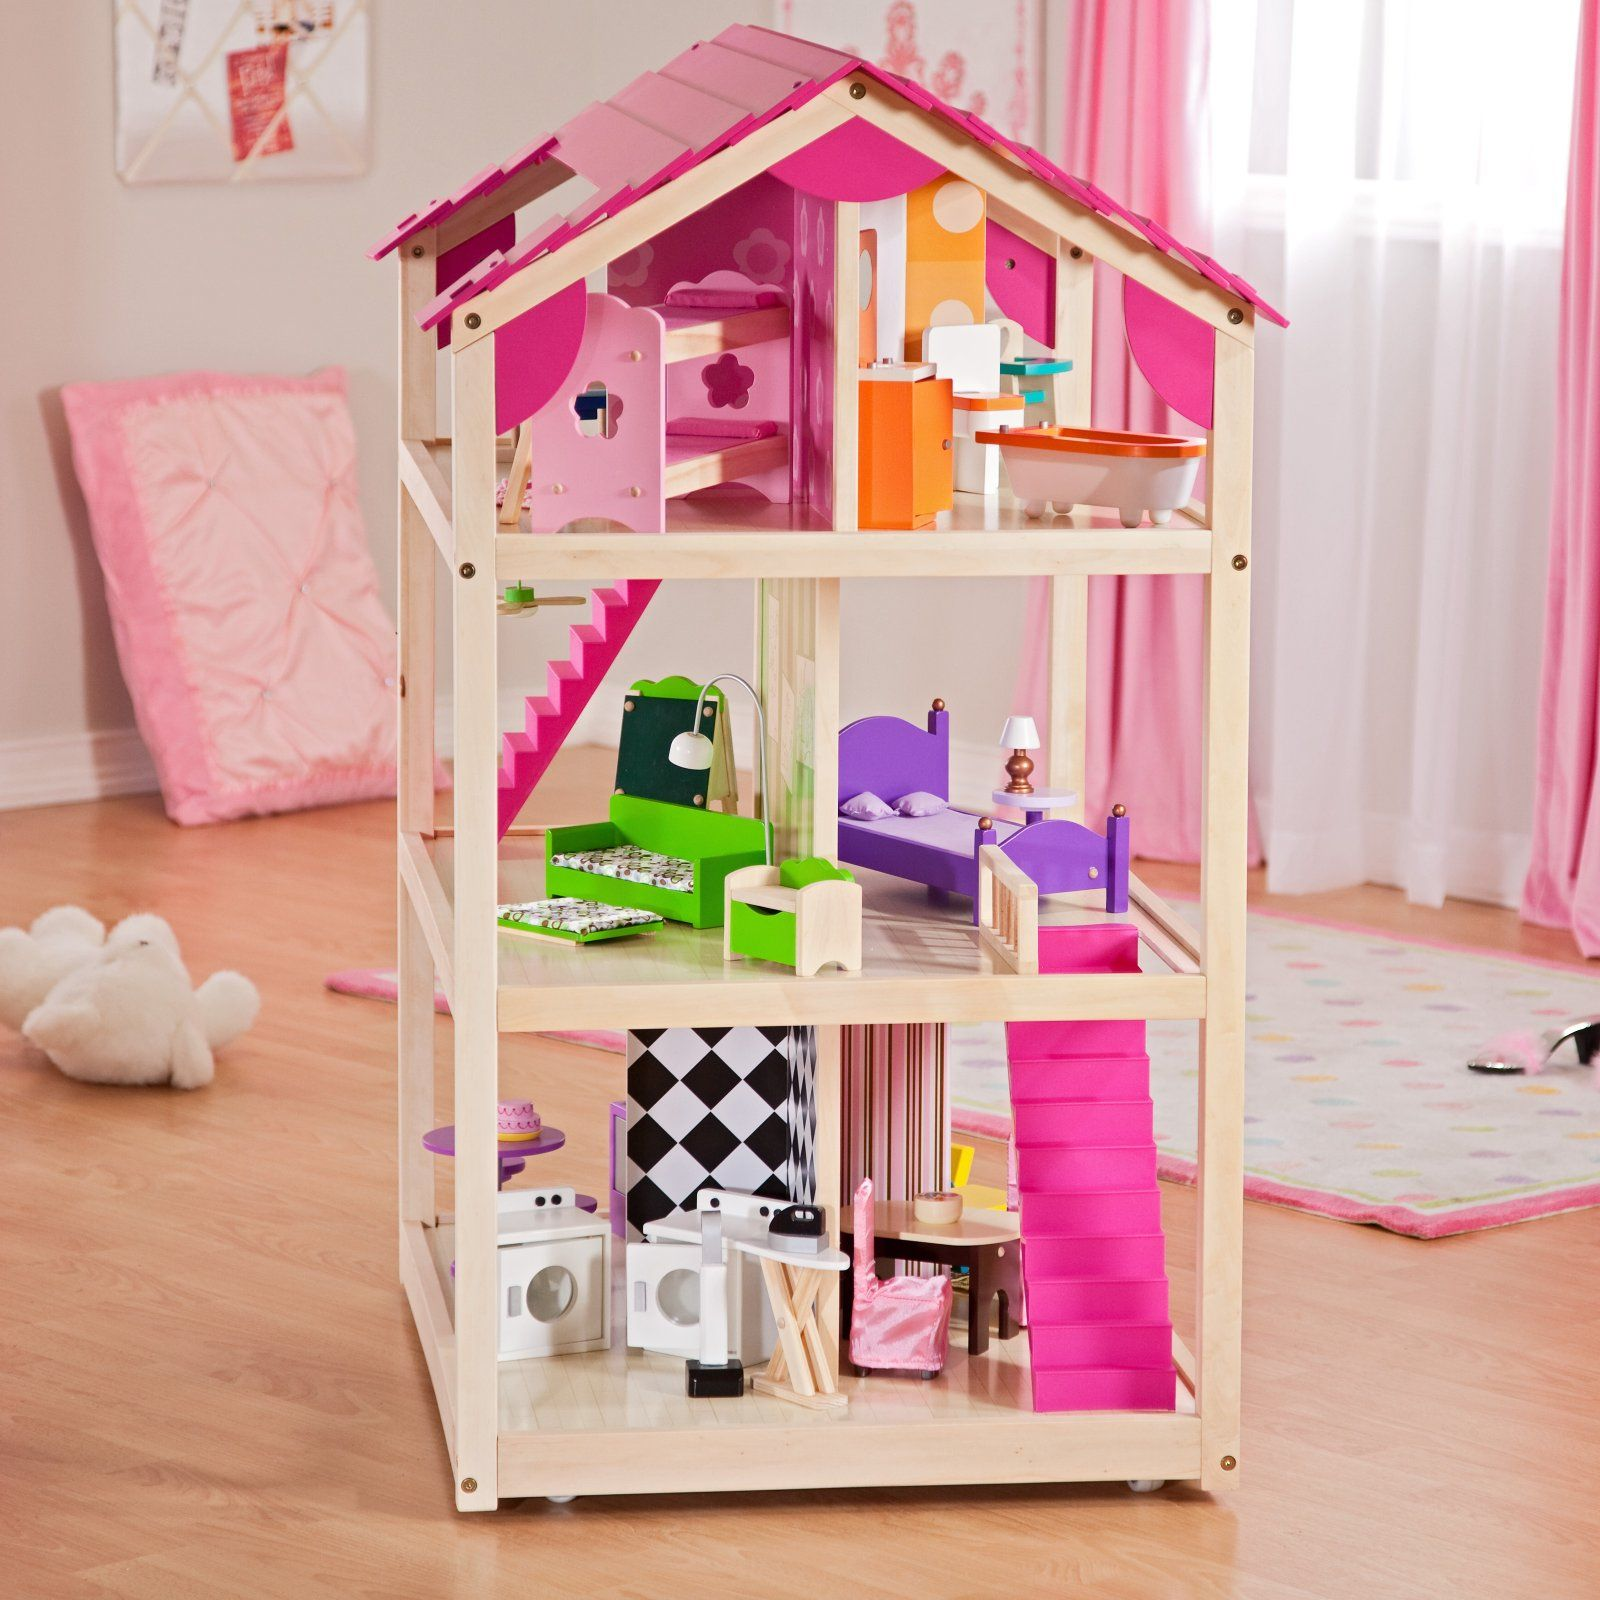 KidKraft So Chic Dollhouse Toy Dollhouses at Doll Houses